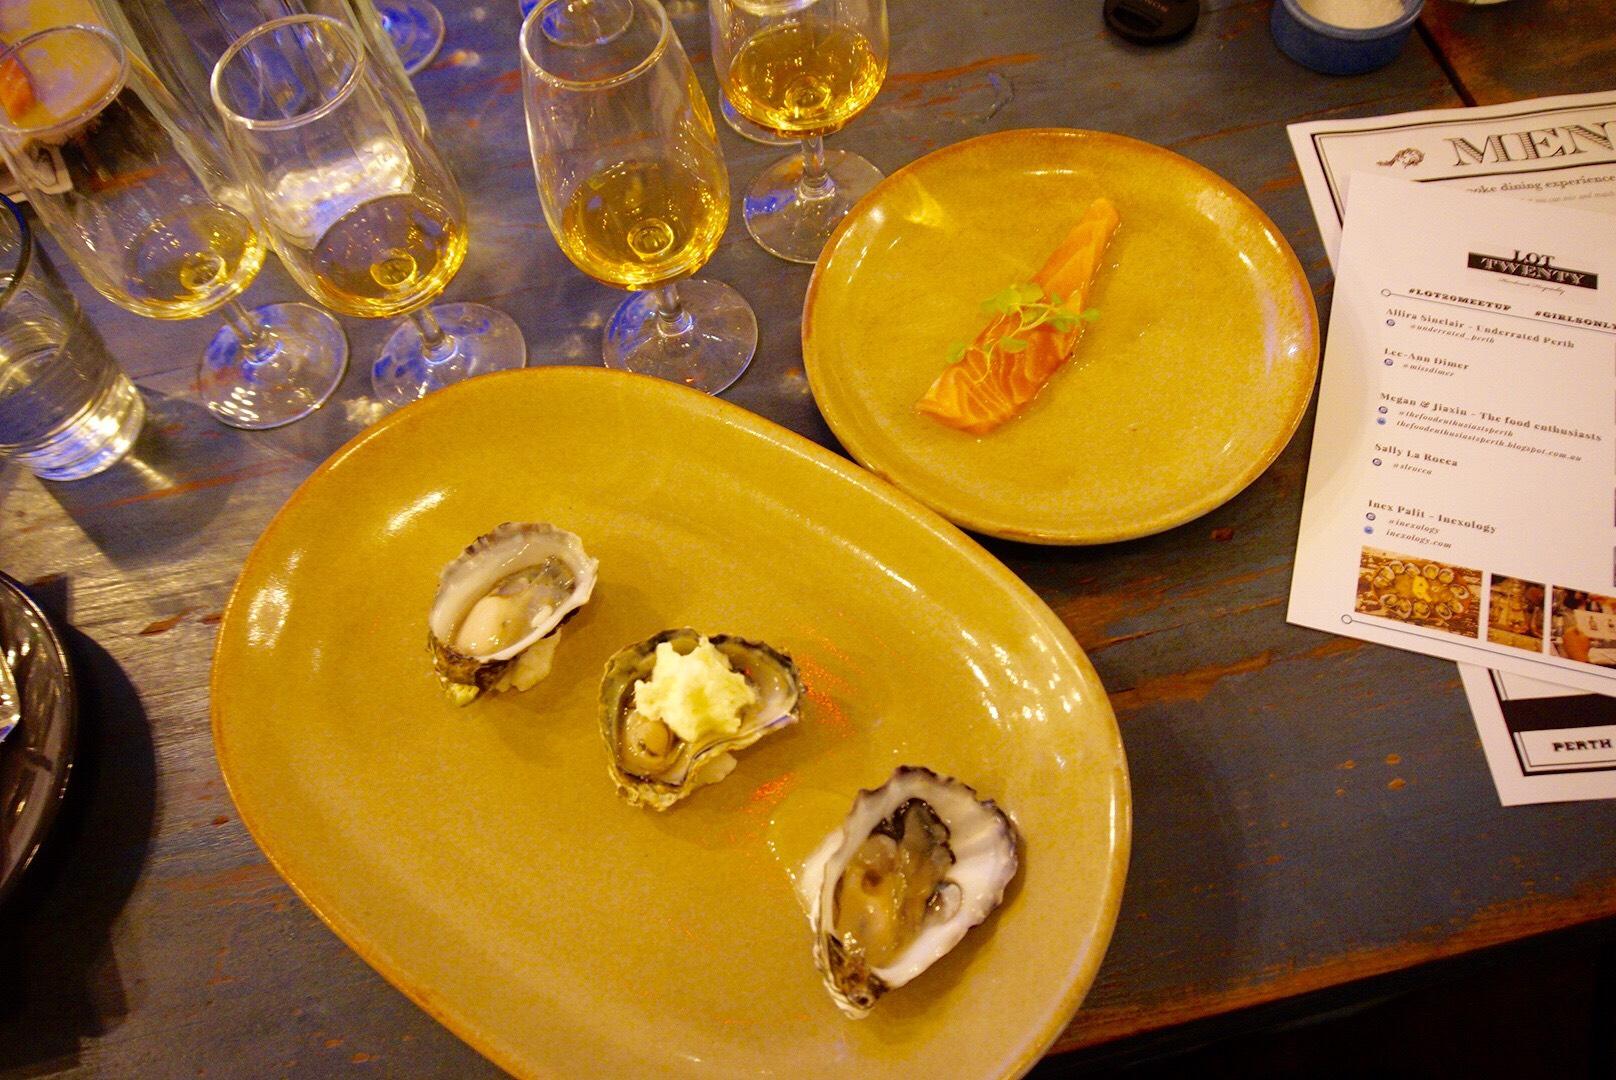 Cold smoked oyster with horseradish cream, plus sashimi salmon with vanilla oil